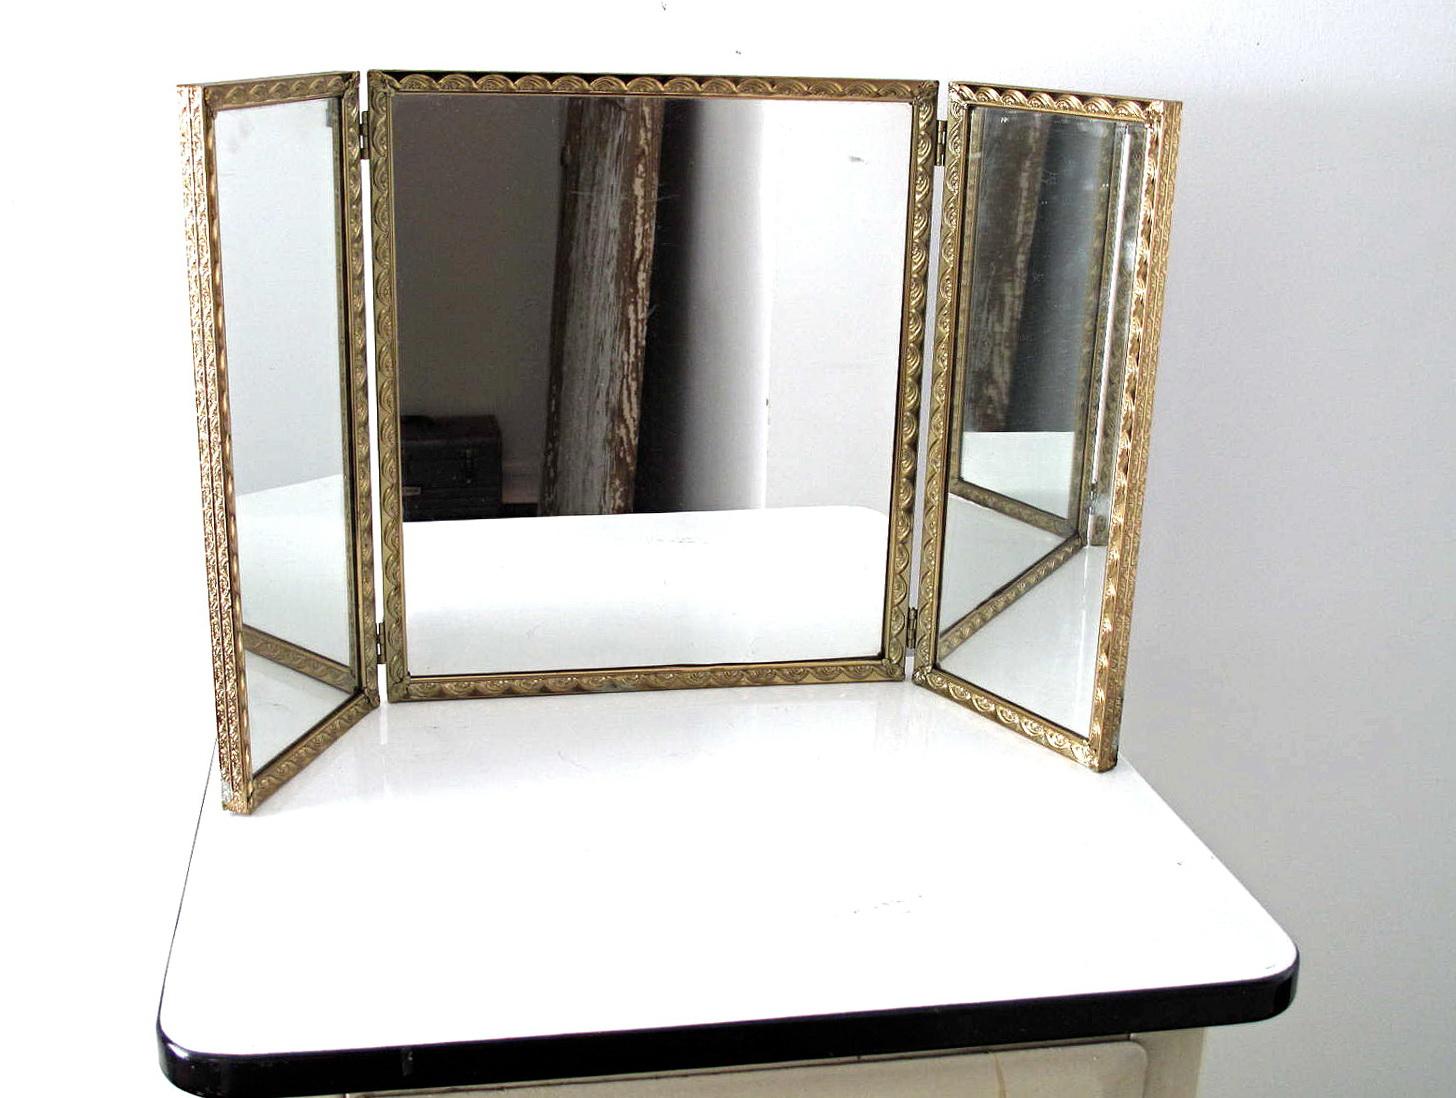 Tri Fold Vanity Mirrors Bathroom | Home Design Ideas